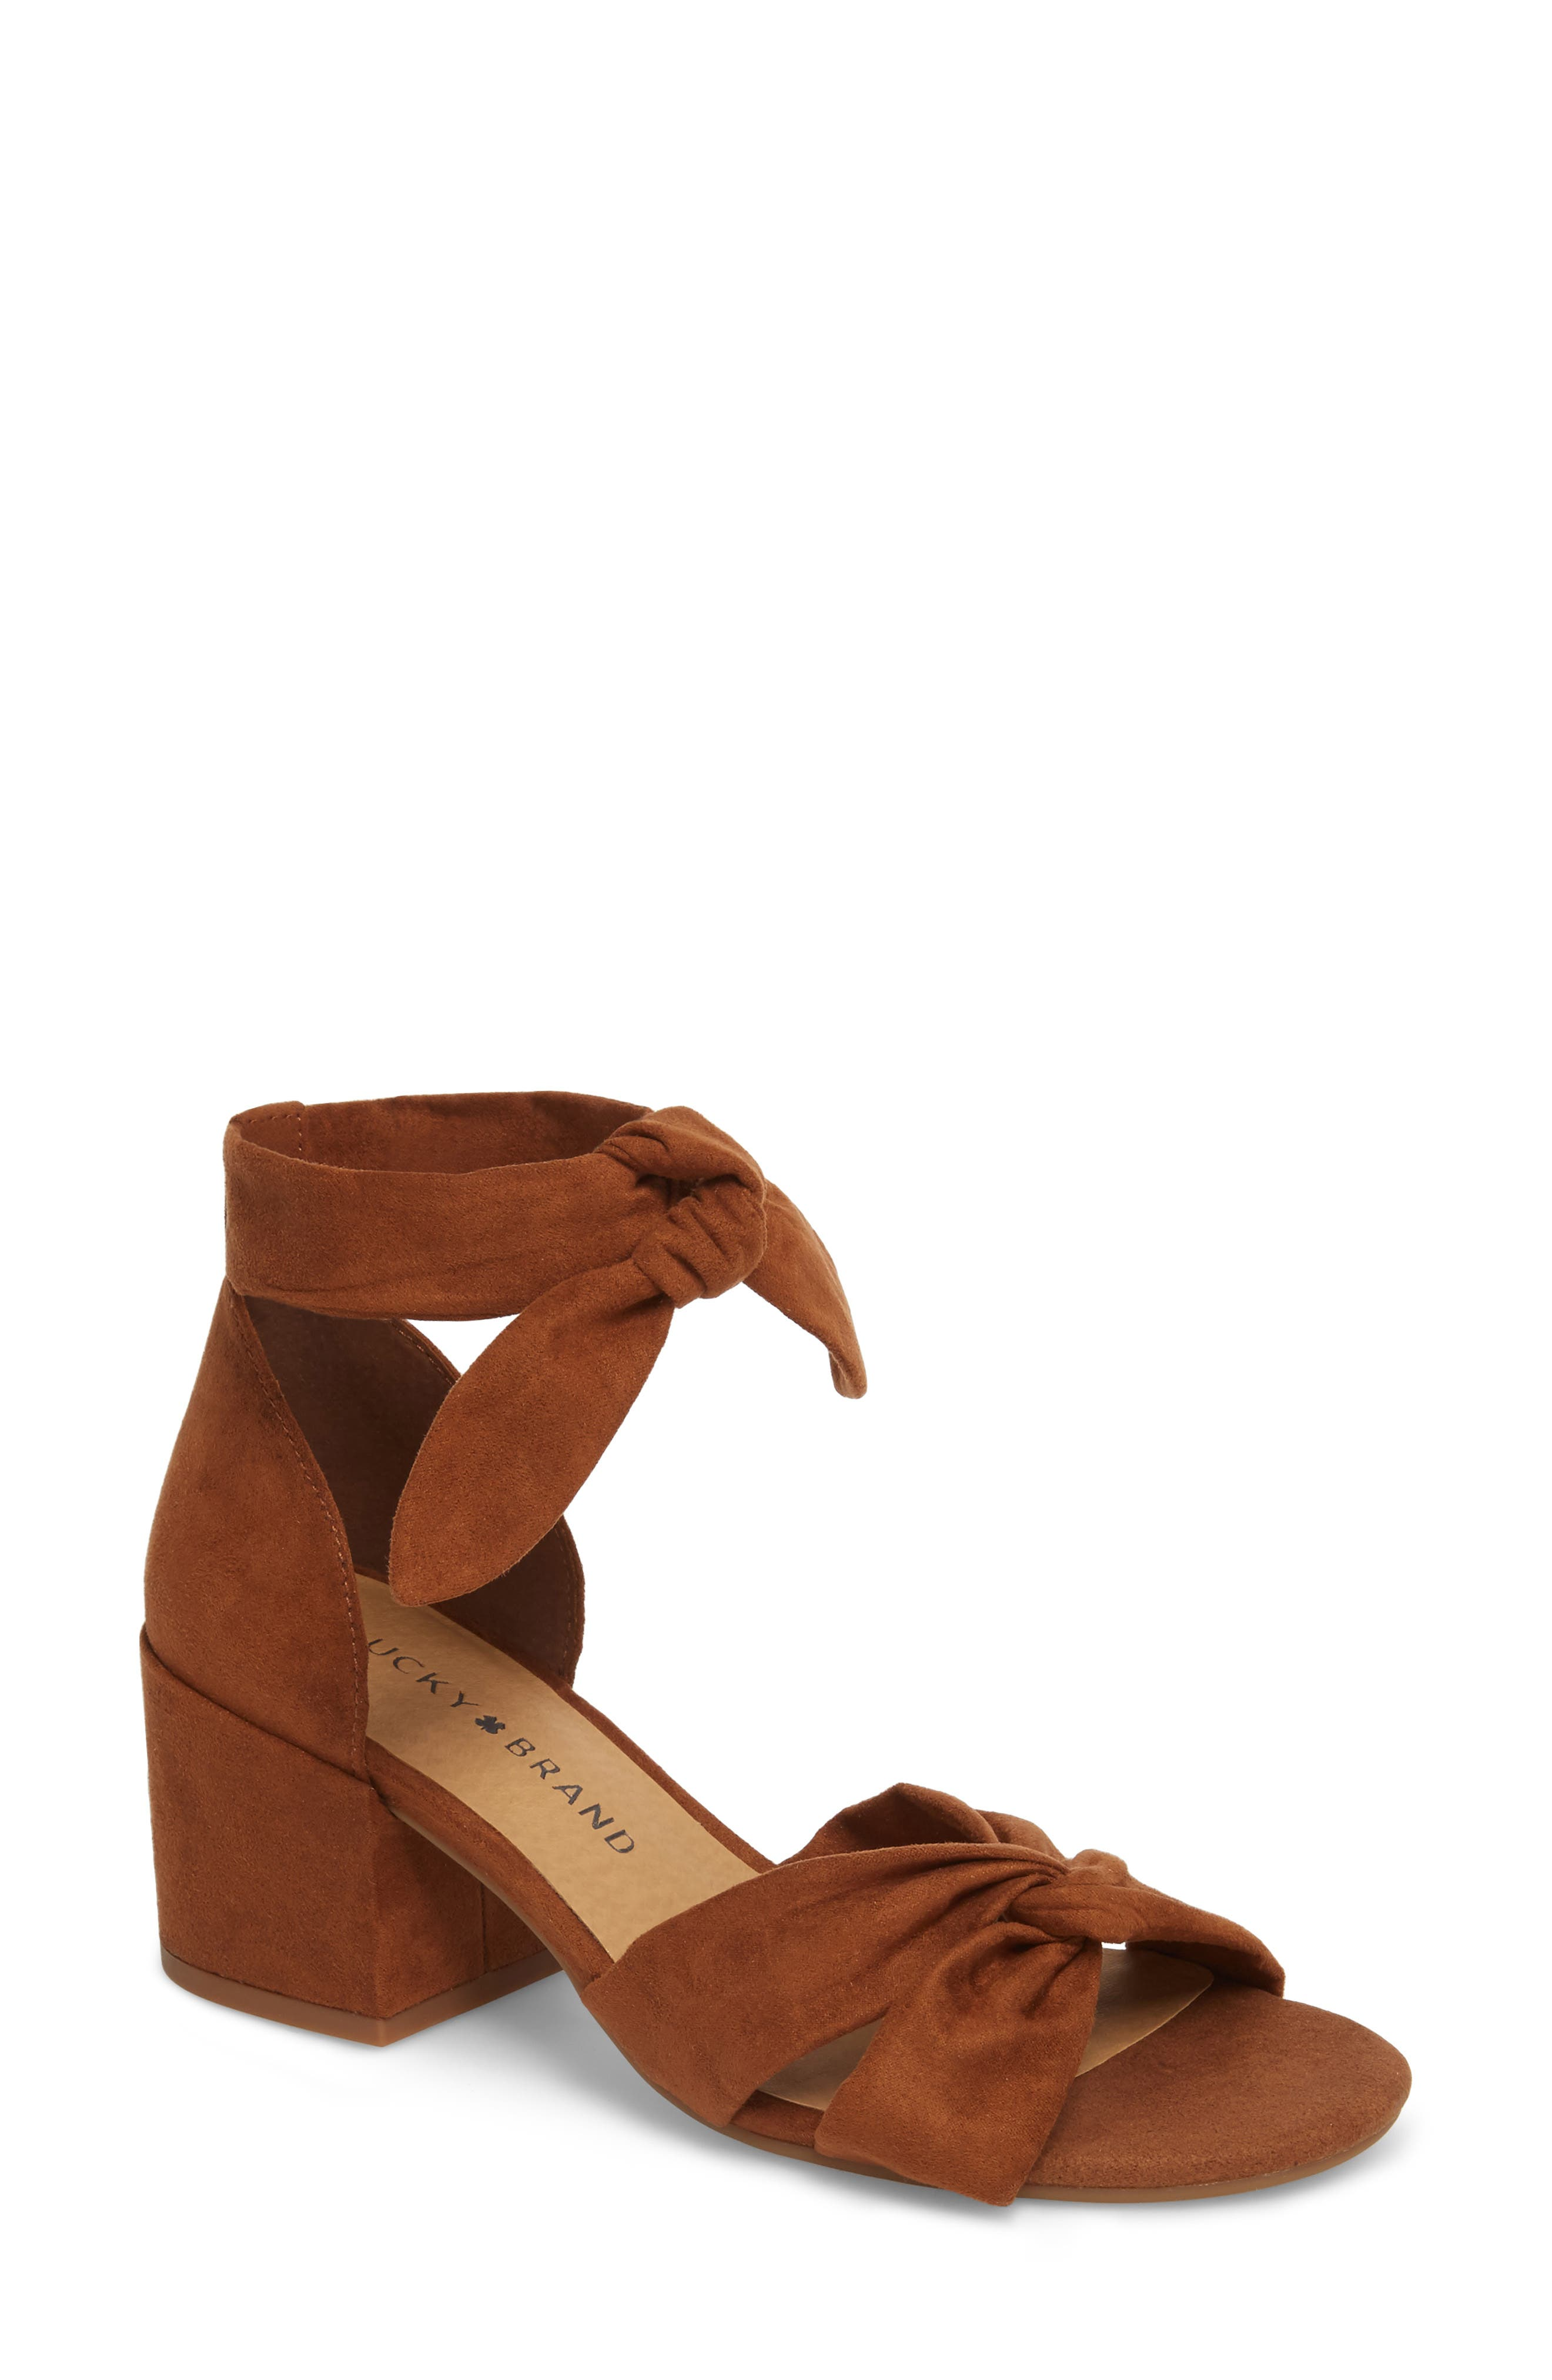 Xaylah Ankle Strap Sandal,                             Main thumbnail 1, color,                             Cedar Leather